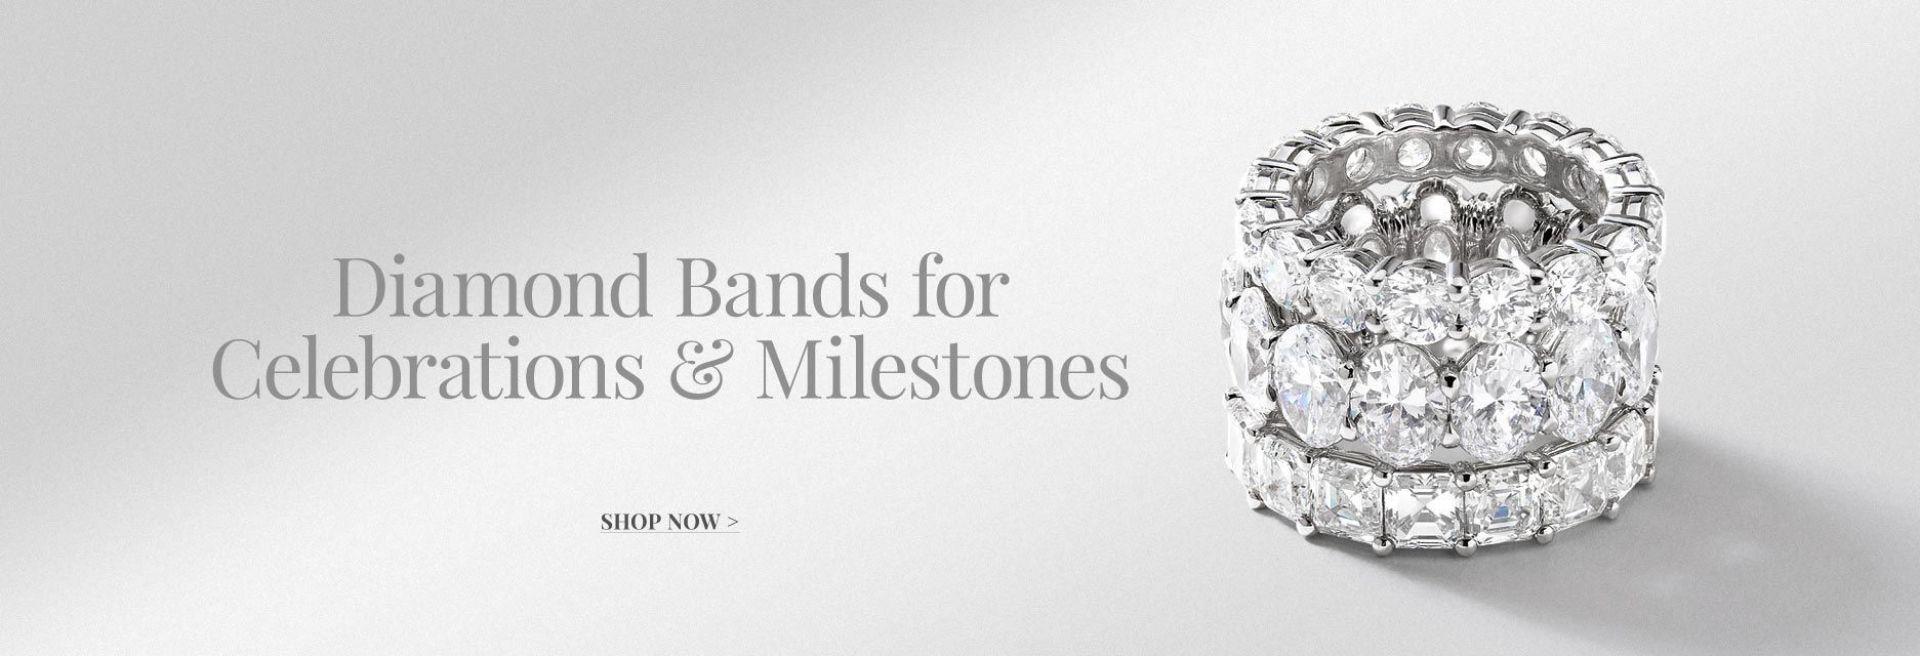 Diamond Bands For Celebration and Milestones